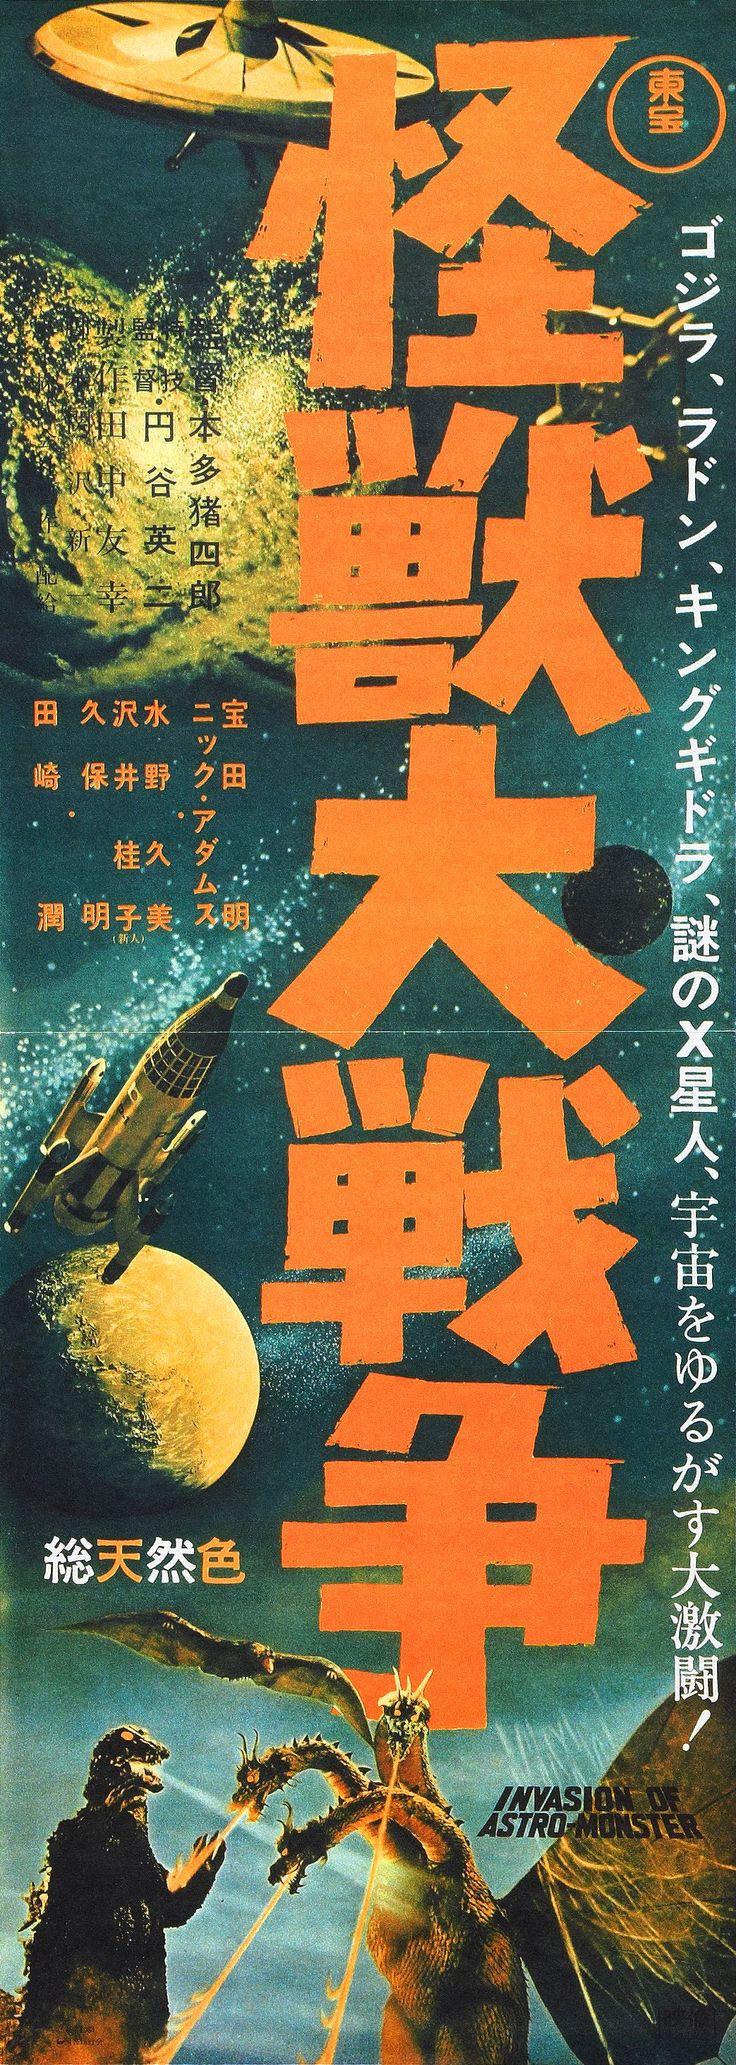 Godzilla vs. Monster Zero (Kaijû daisenso, aka Invasion of Astro Monster, aka Monster Zero) (1965, Japan)